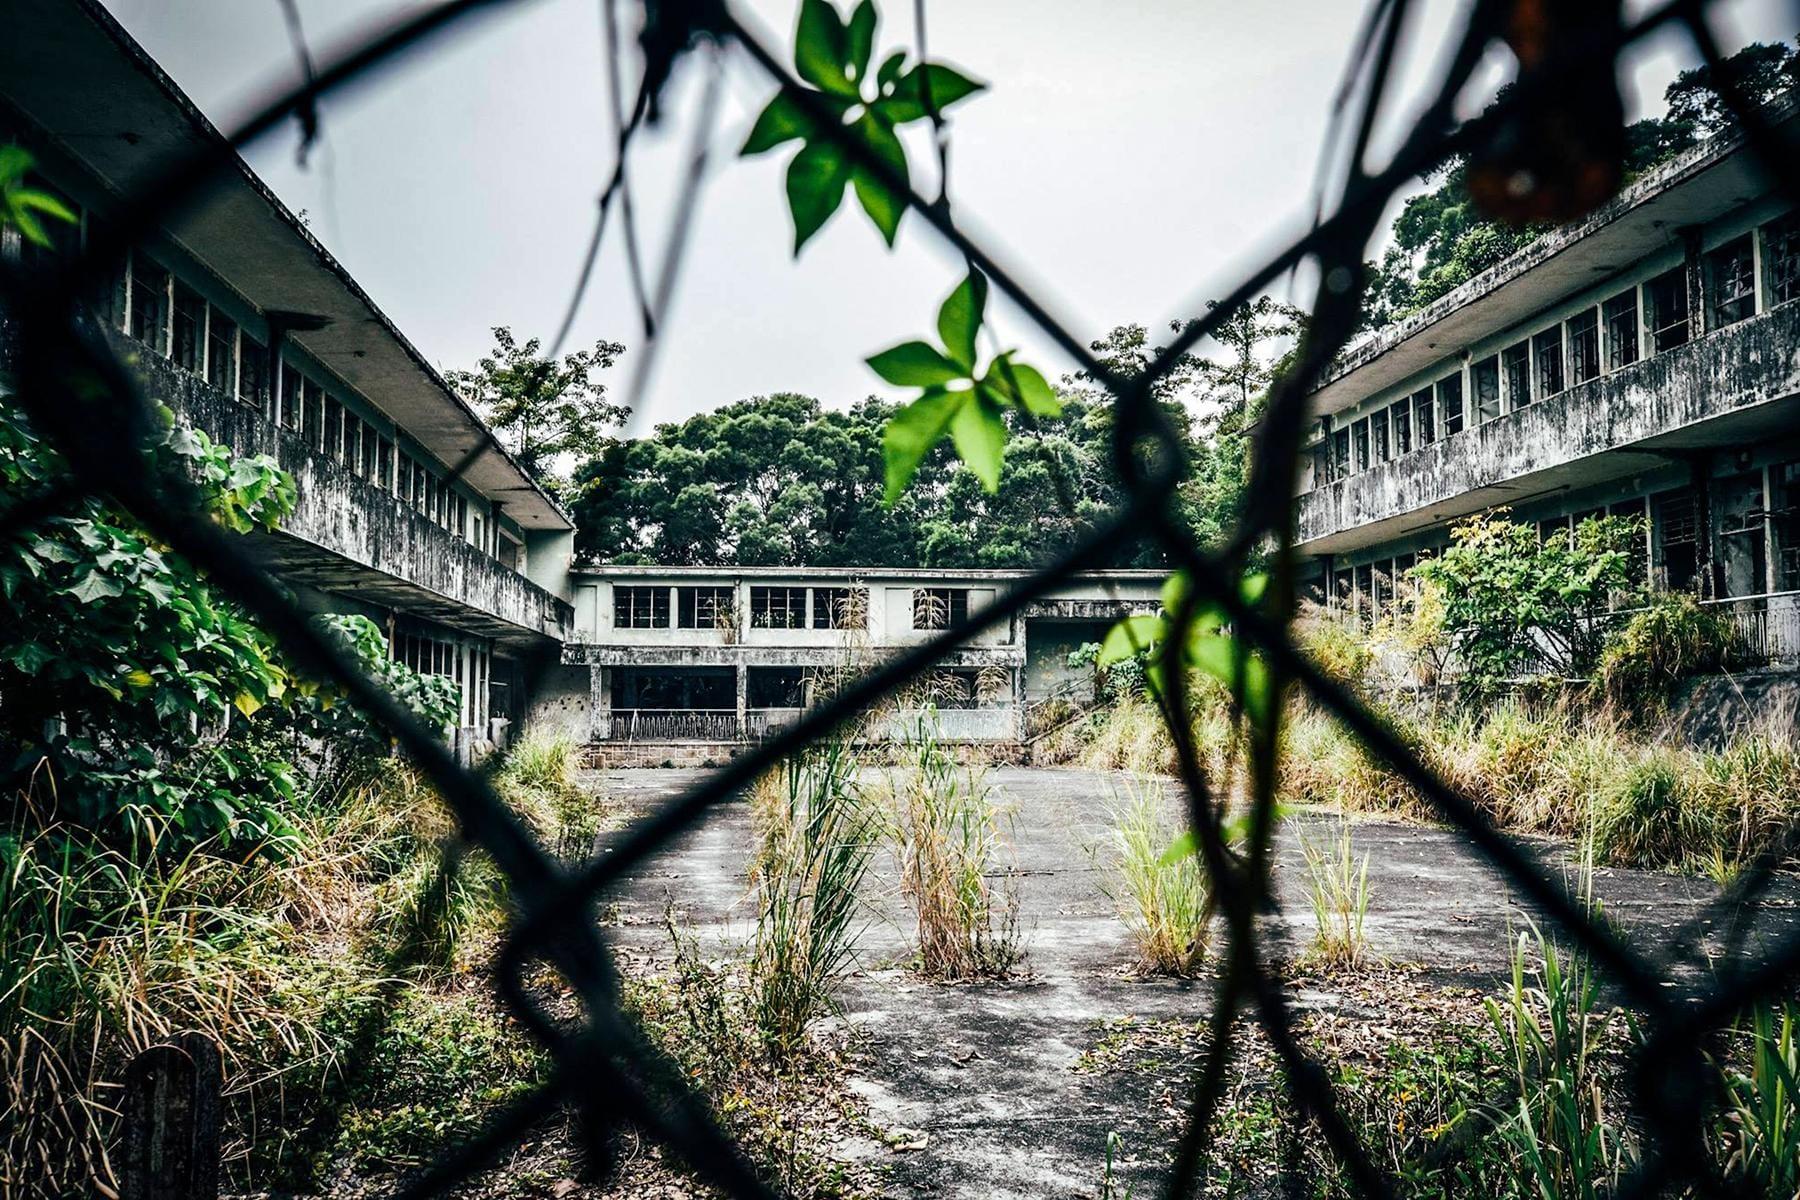 Incredible Abandoned Places In Hong Kong